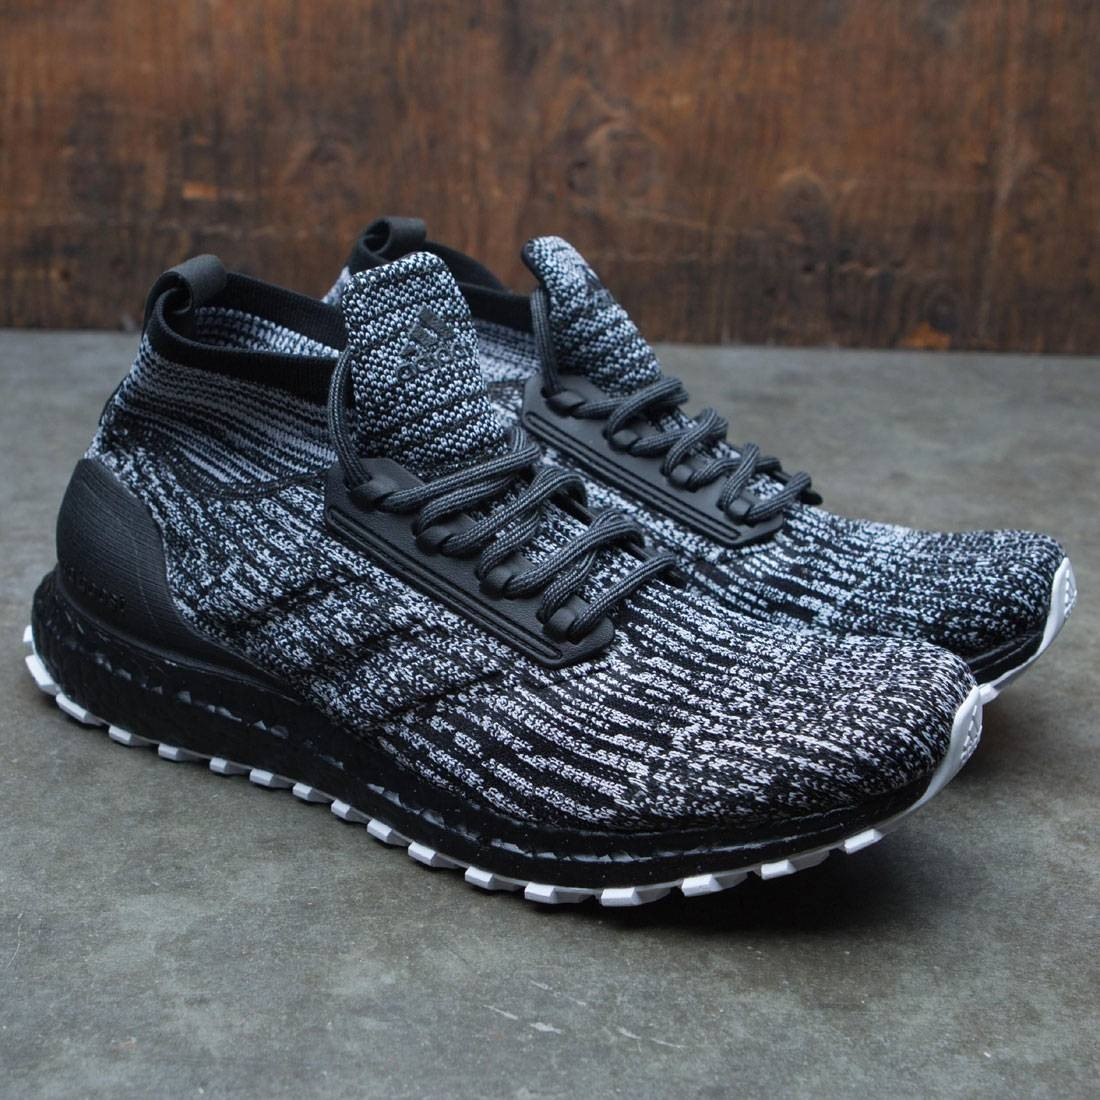 Adidas Men Ultraboost All Terrain Ltd Black Core Black